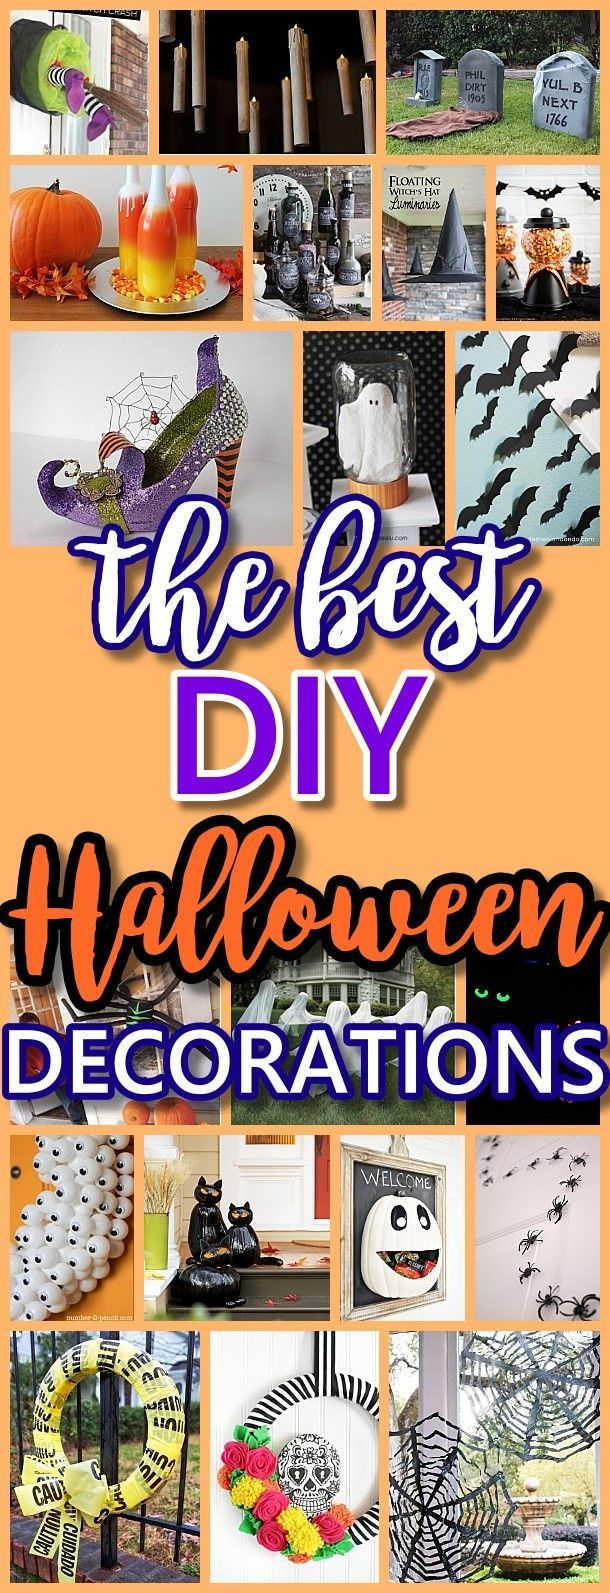 The BEST Do it Yourself Halloween Decorations {Spooktacular Halloween DIYs, Handmade Crafts and Projects!} #halloween #halloweendecorations